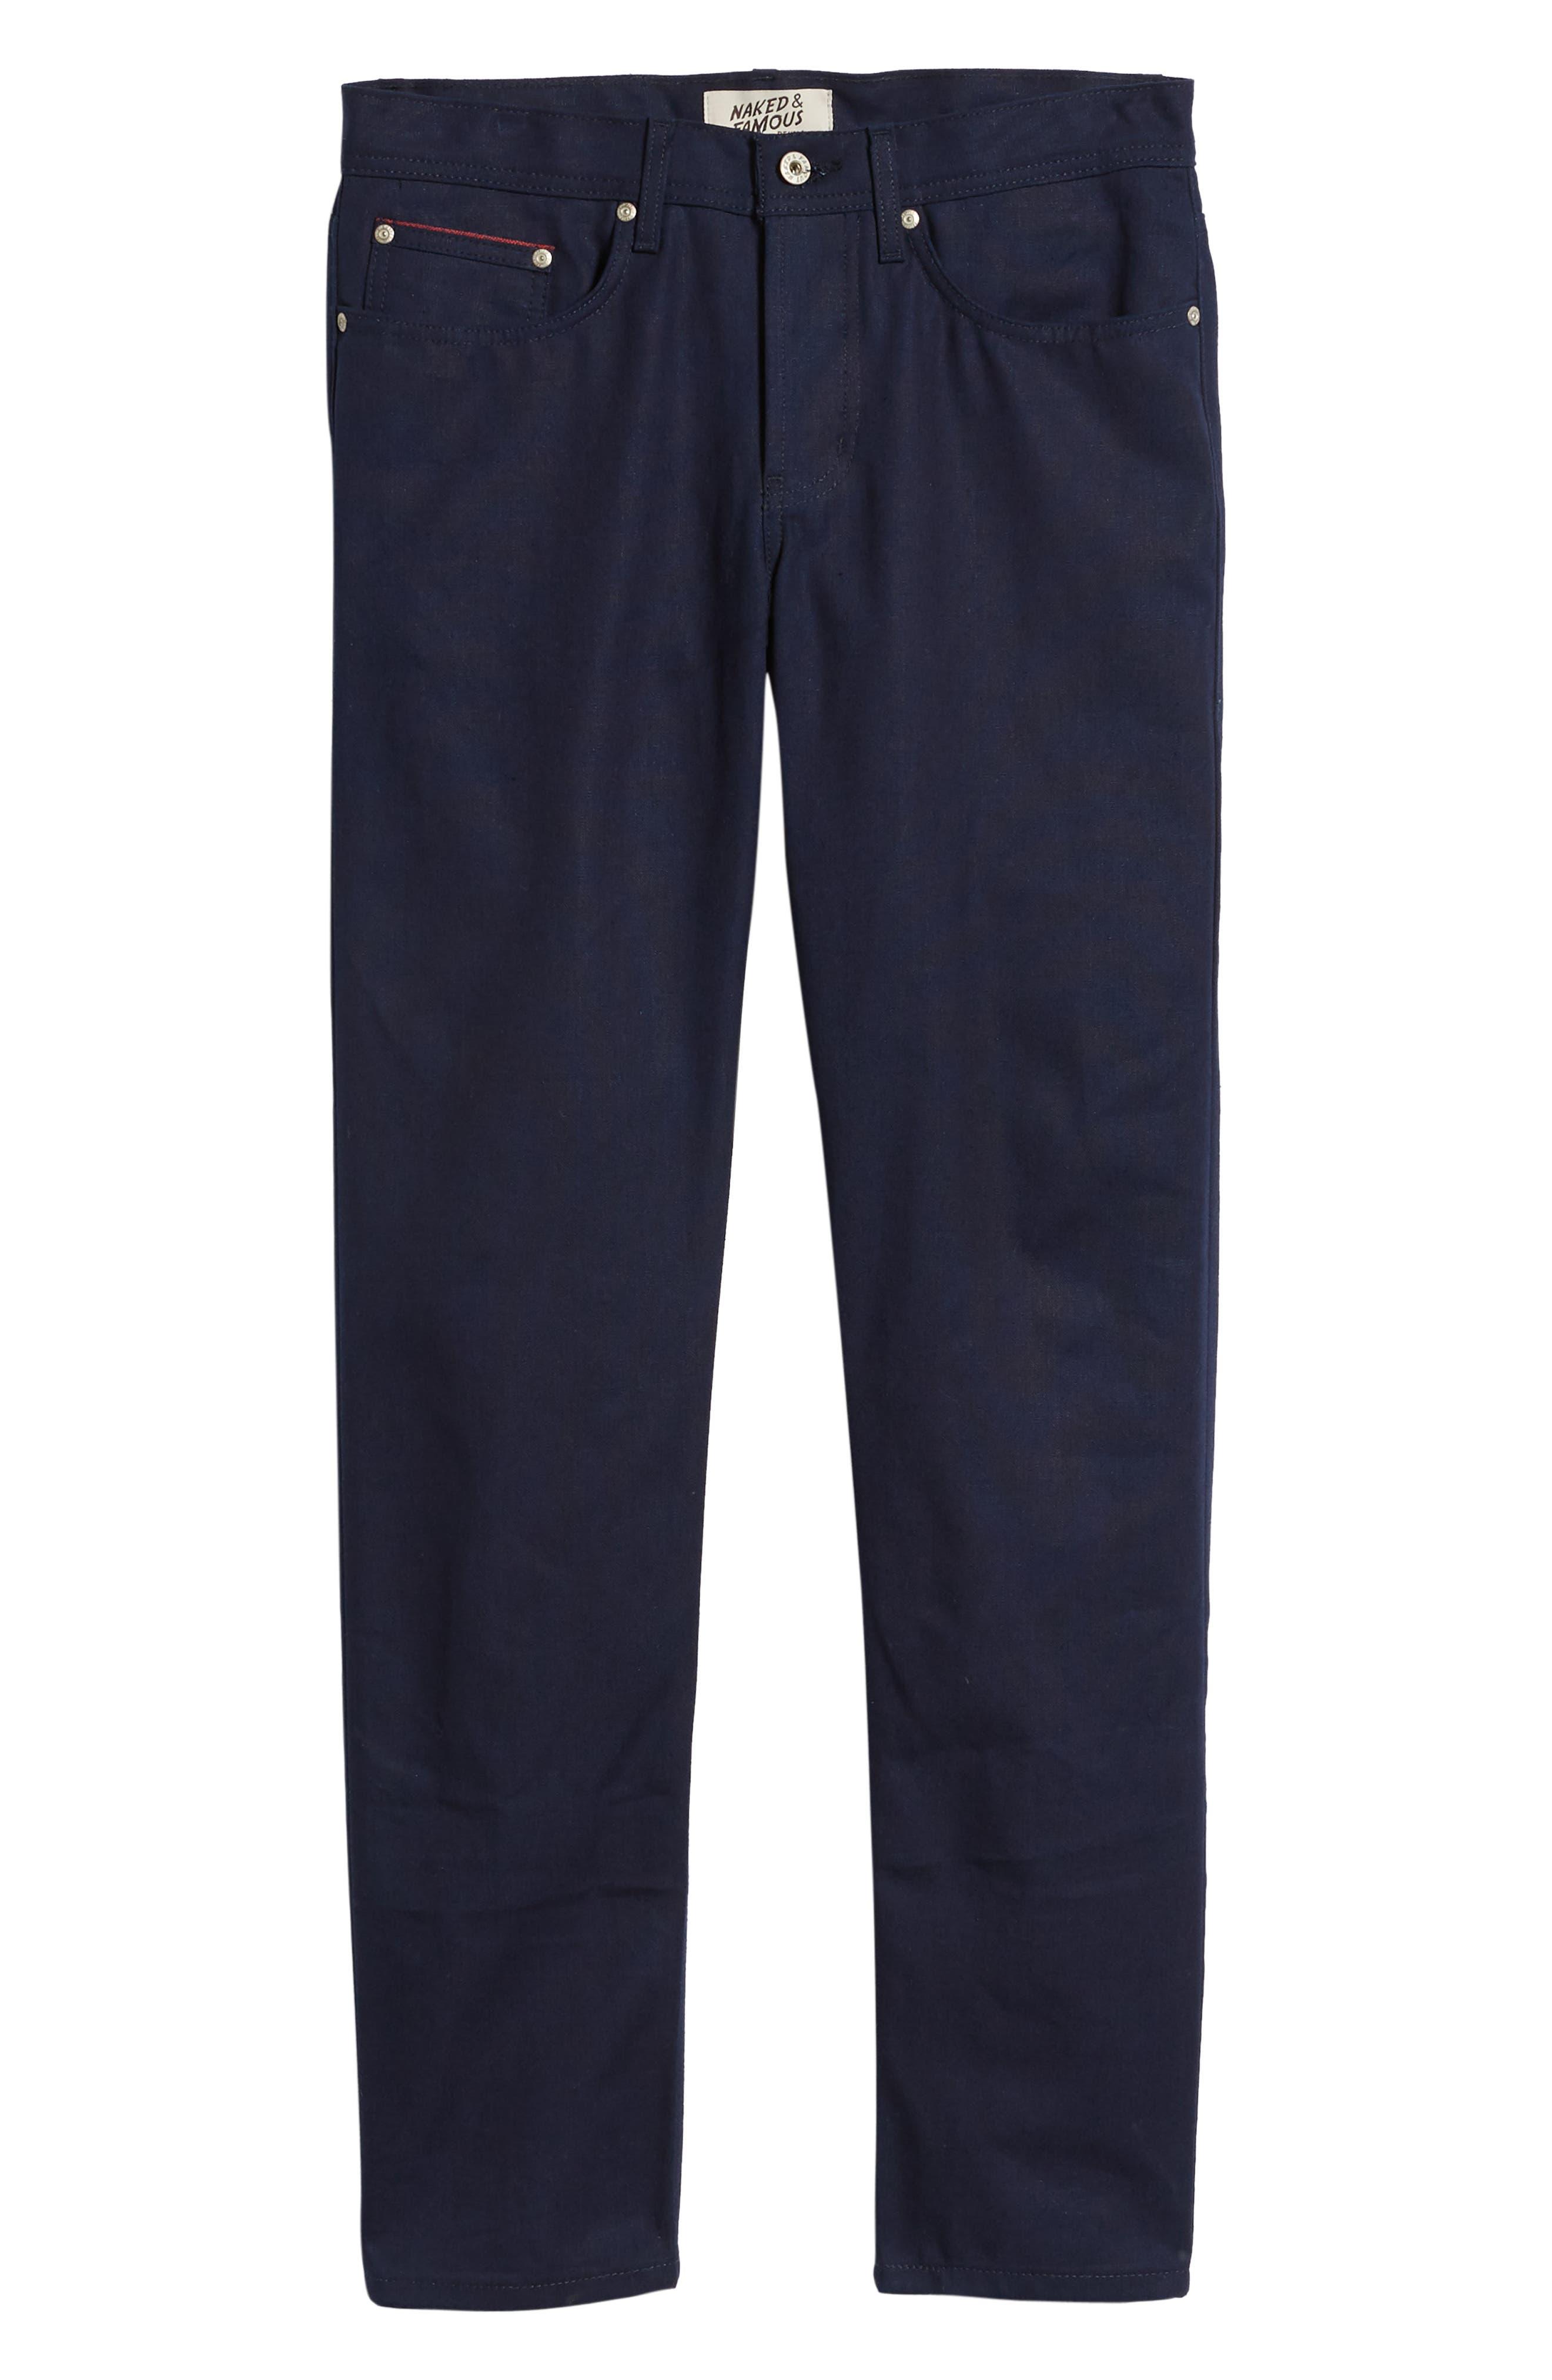 Weird Guy Slim Fit Jeans,                             Alternate thumbnail 6, color,                             INDIGO DUCK CANVAS SELVEDGE